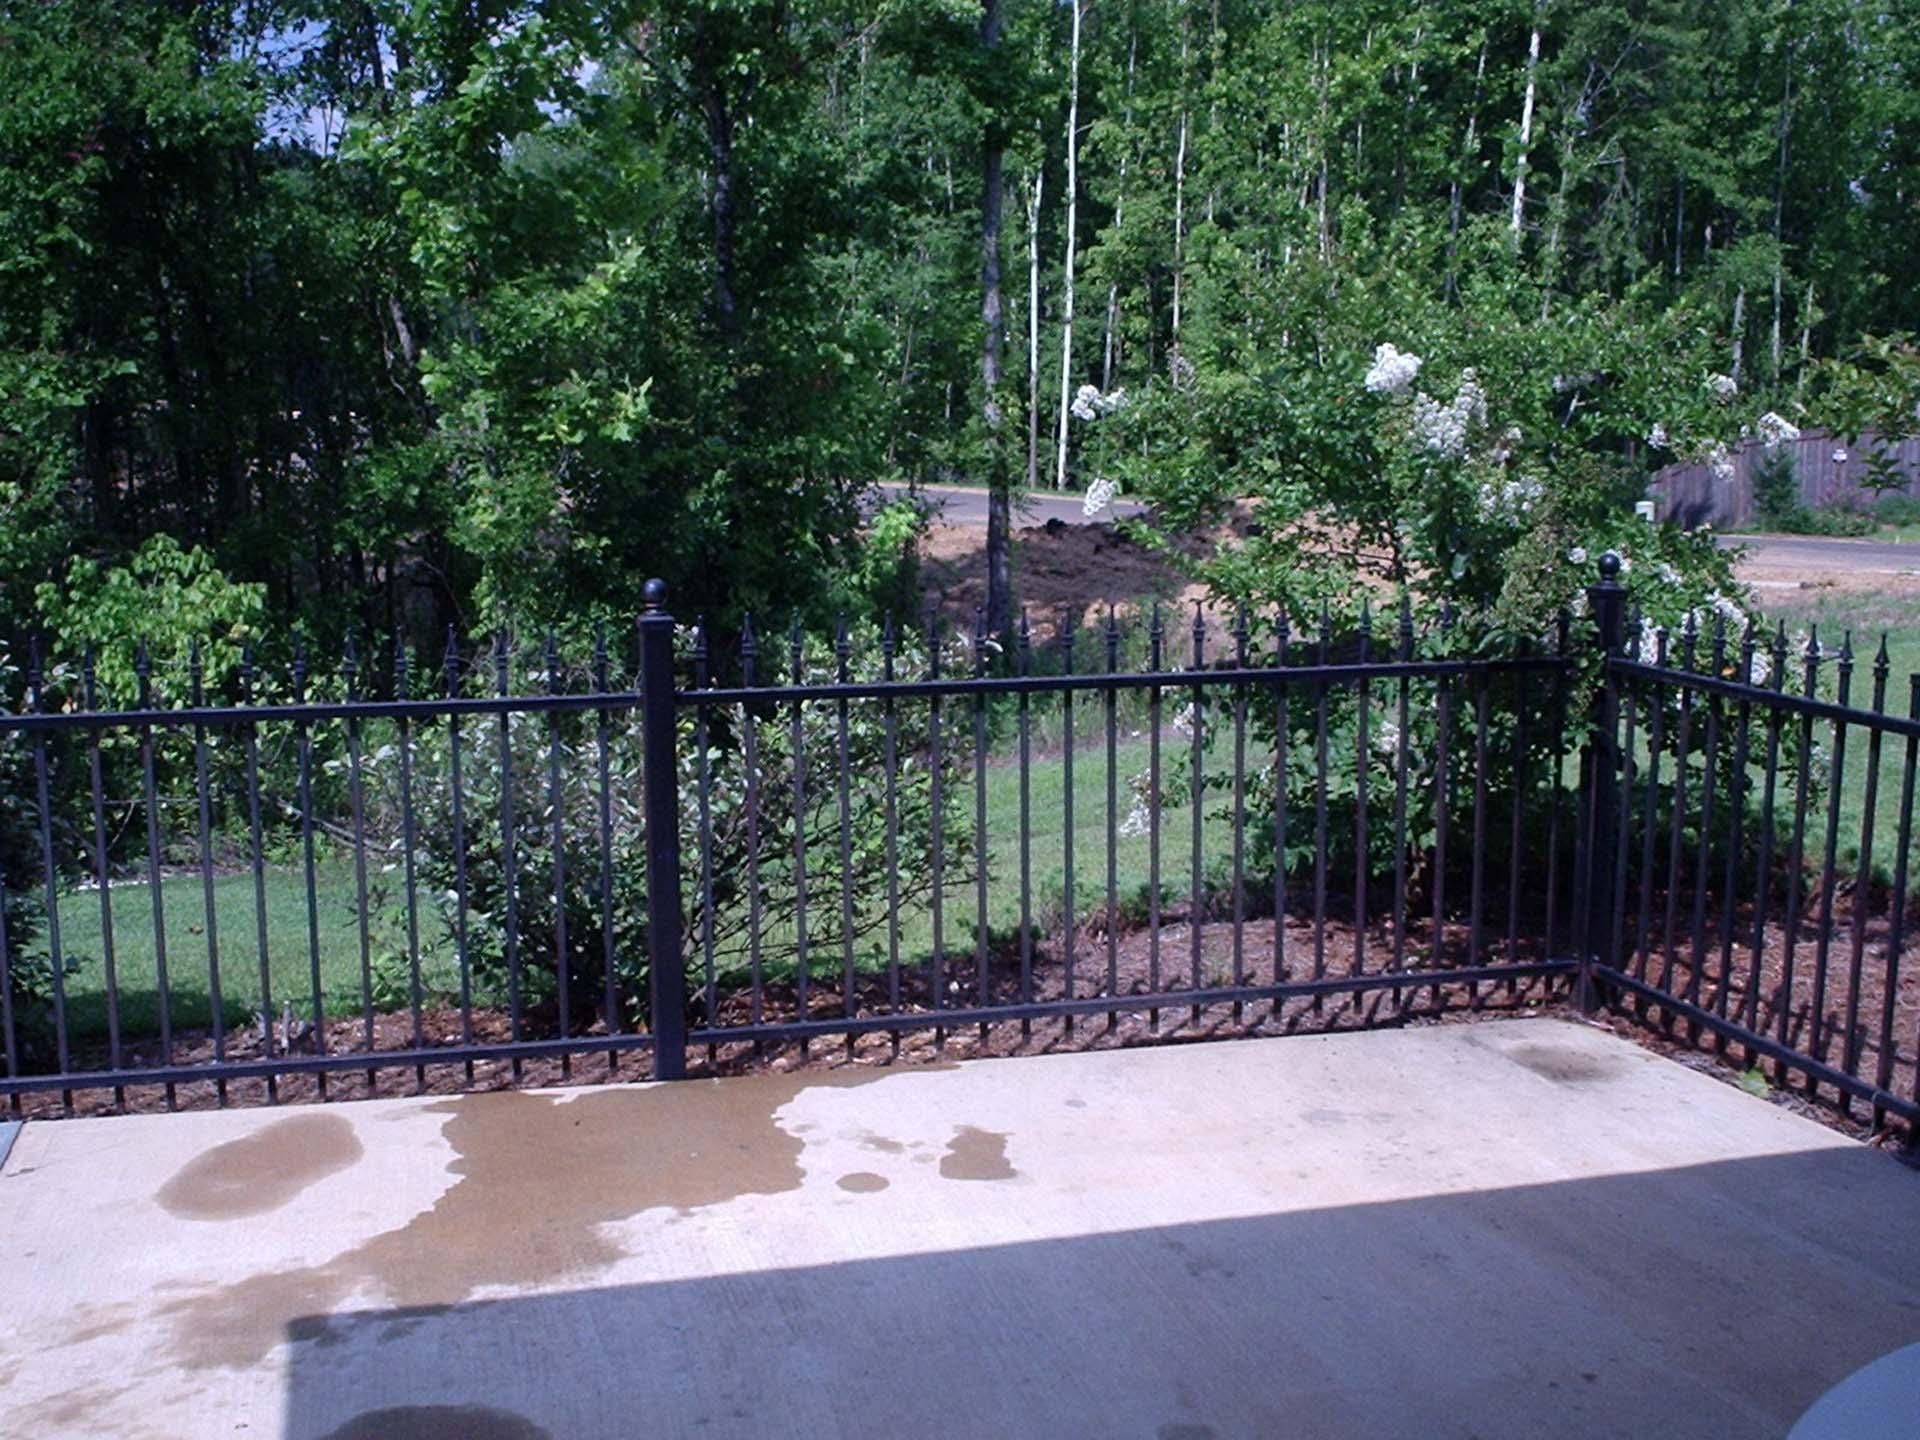 4ft standard pool fence